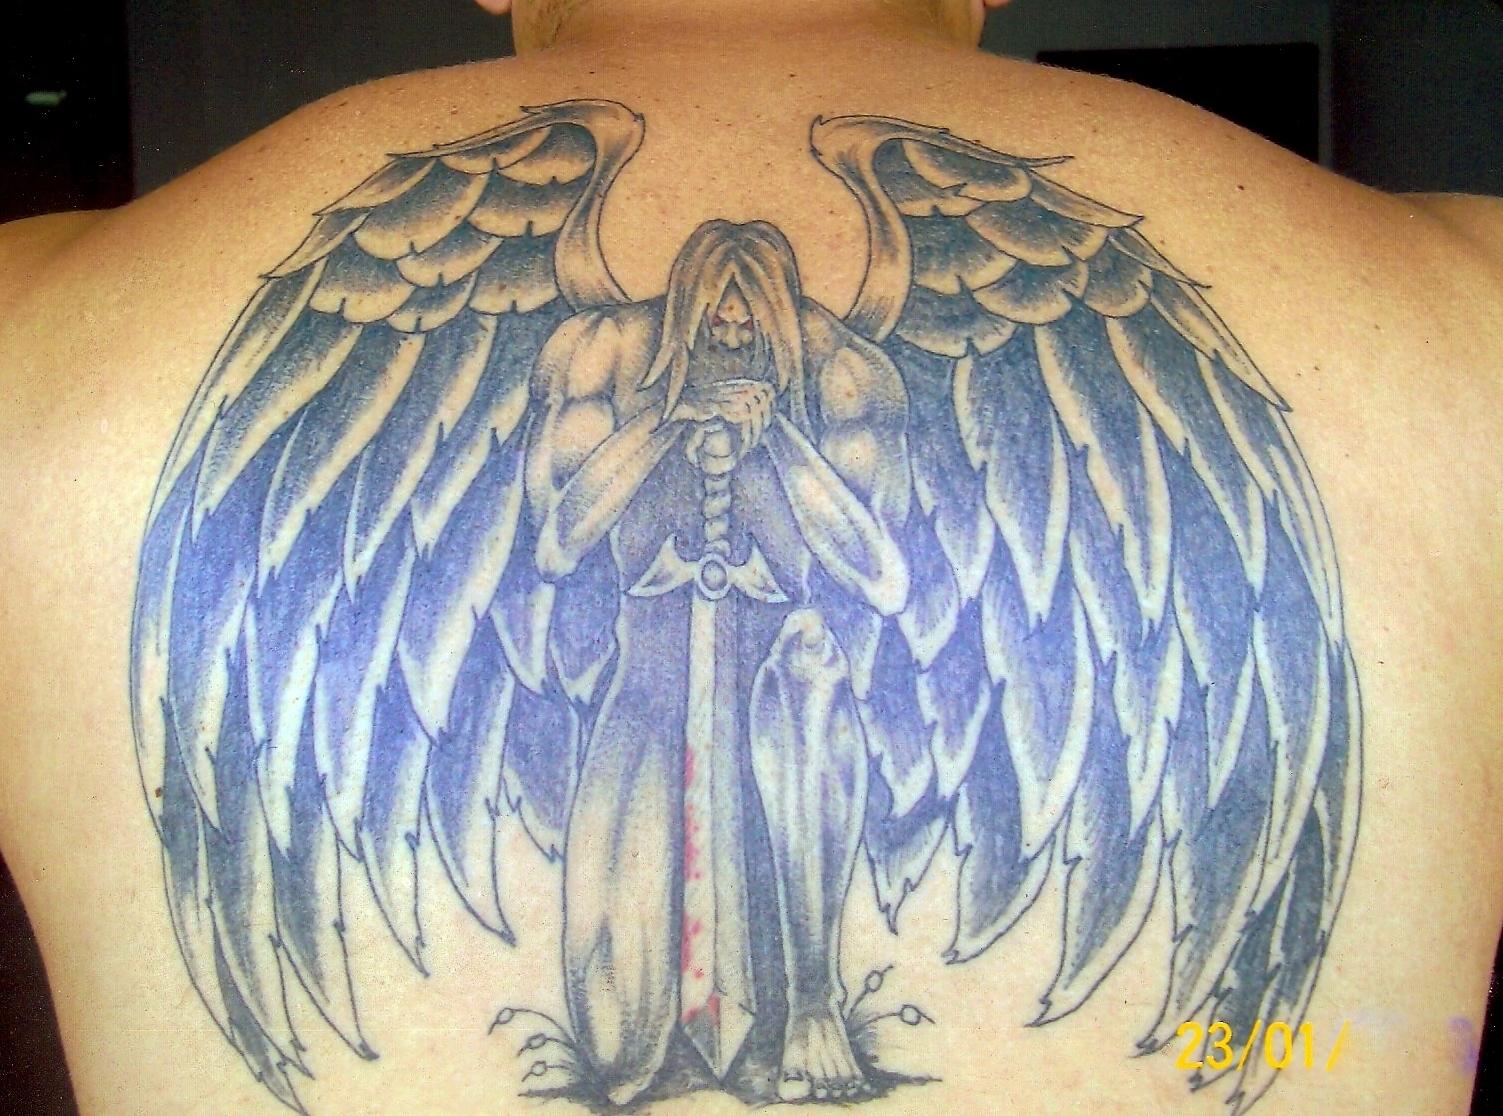 Super Cr Tattoo Studio: anjo GG58